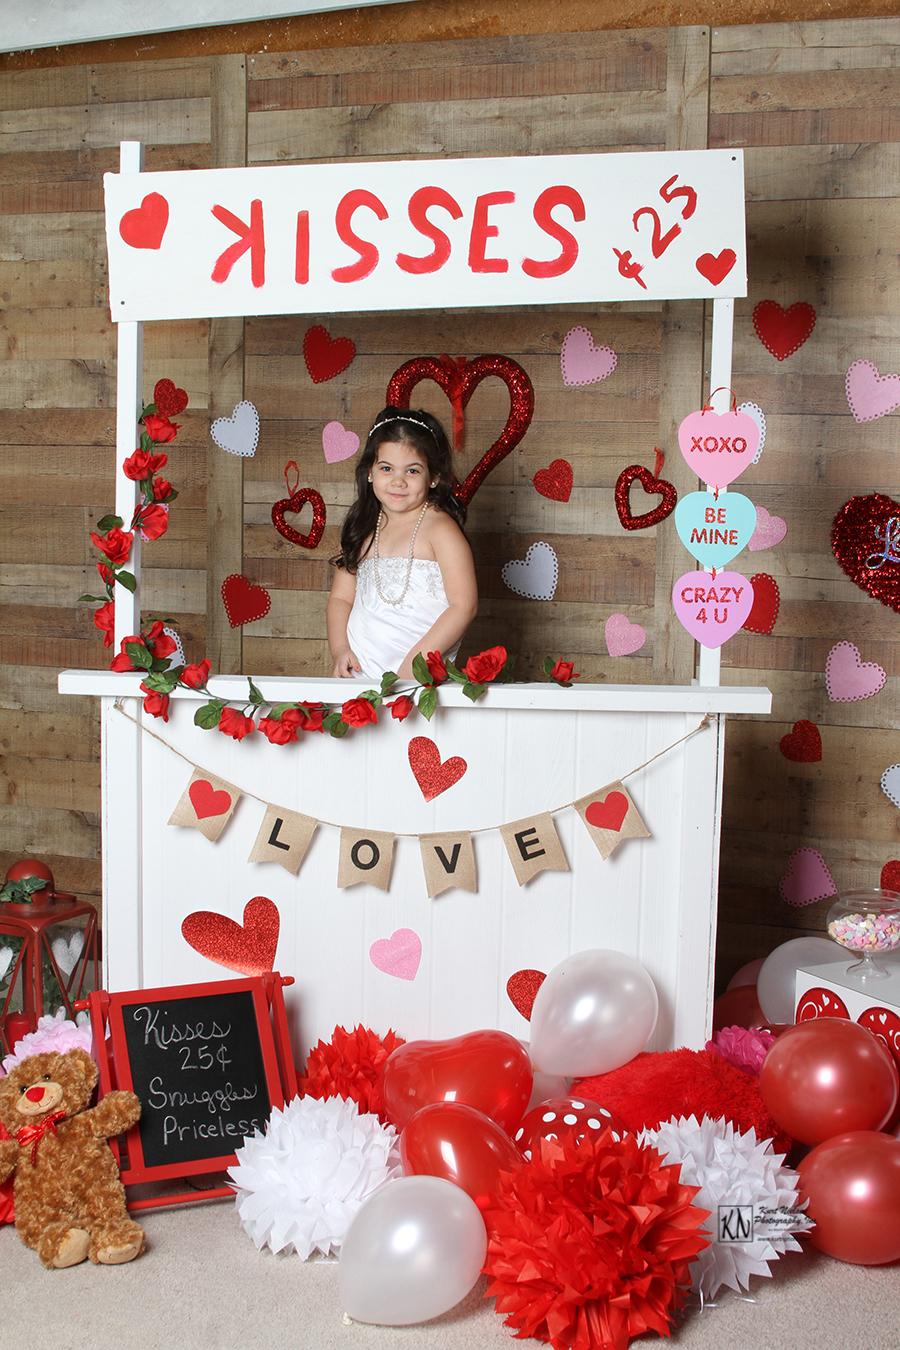 Valentine S Day Mini Photo Sessions Kurt Nielsen Photographyportrait Studio In Toledo Sylvania Oh Kurt Nielsen Photography